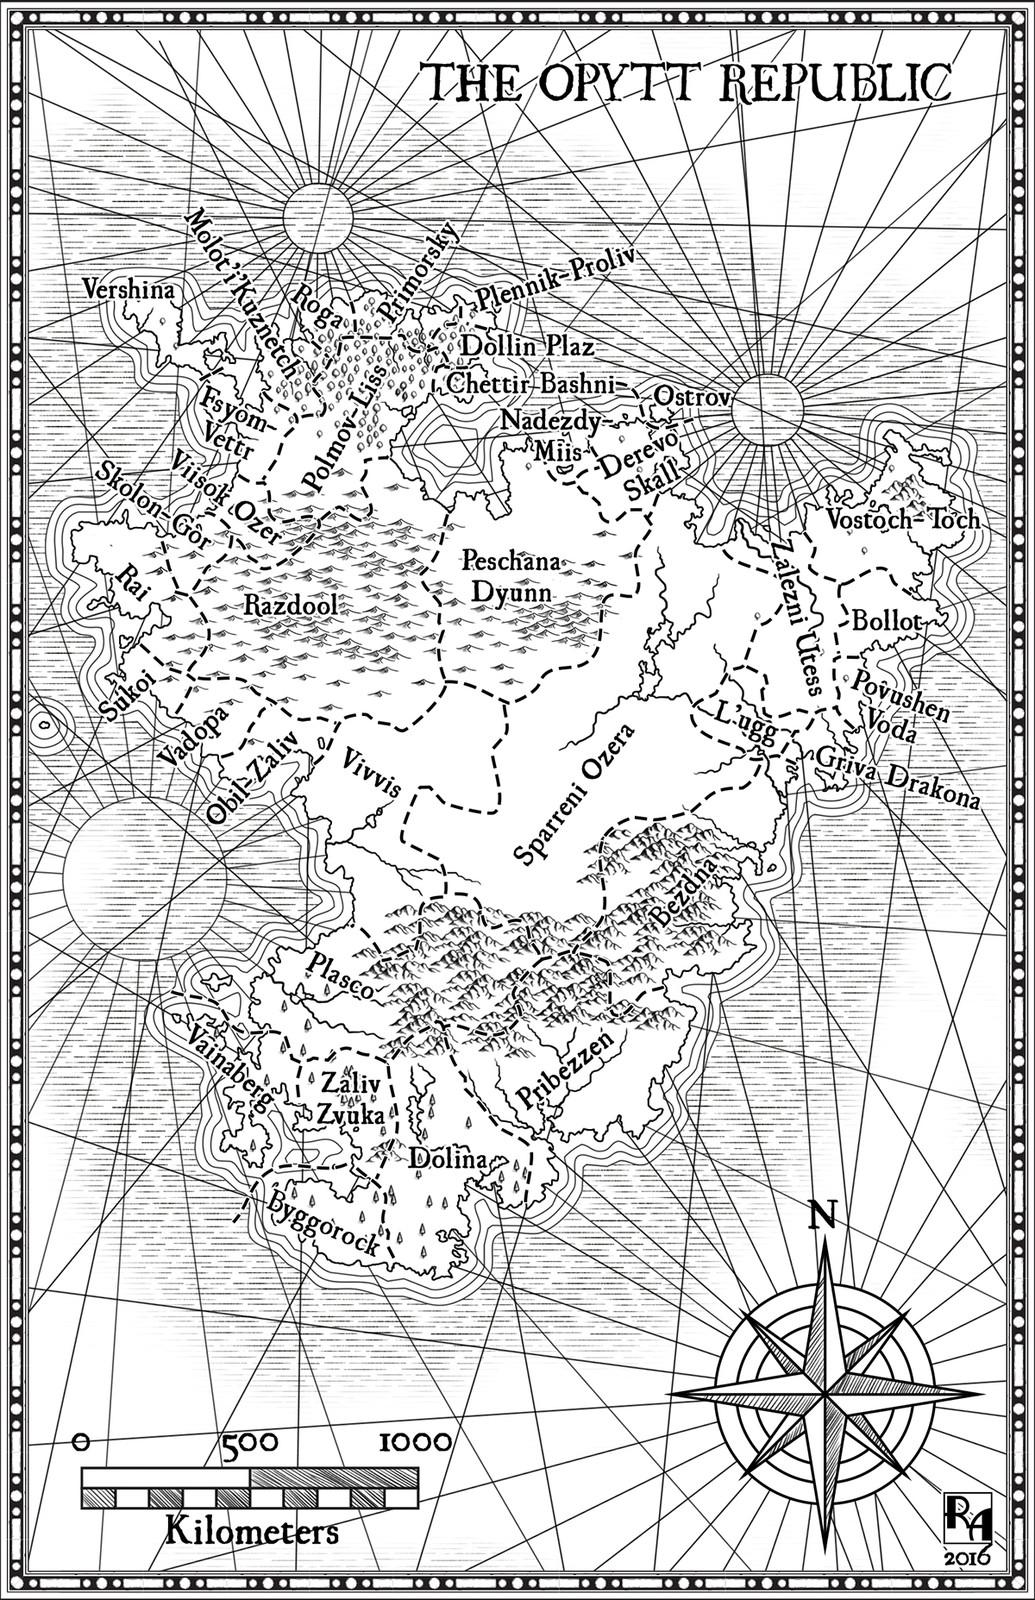 The Opytt Republic